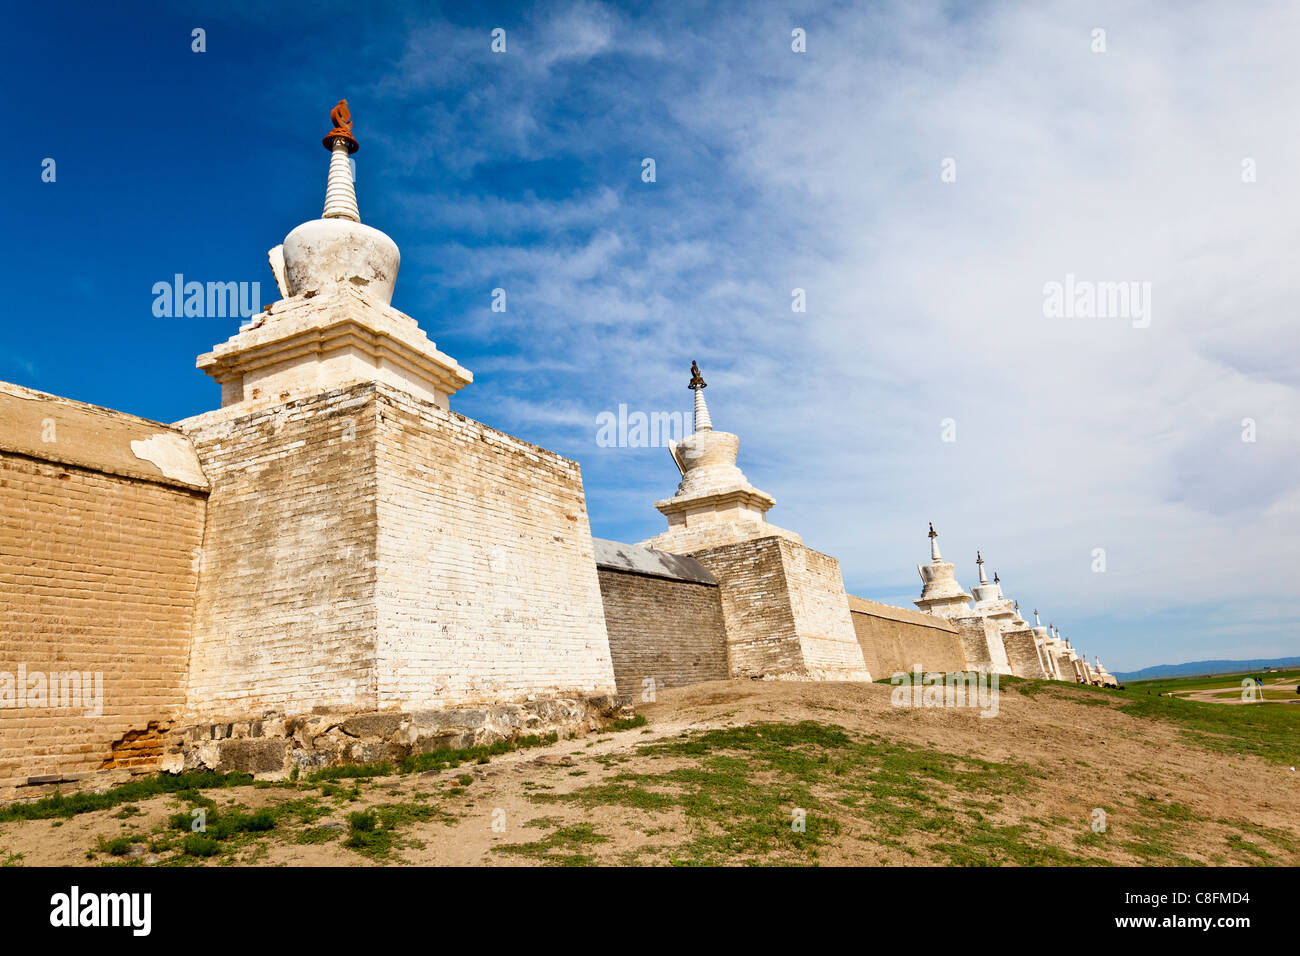 Stupas at the Erdene Zuu Monastery in Karakorum Mongolia - Stock Image